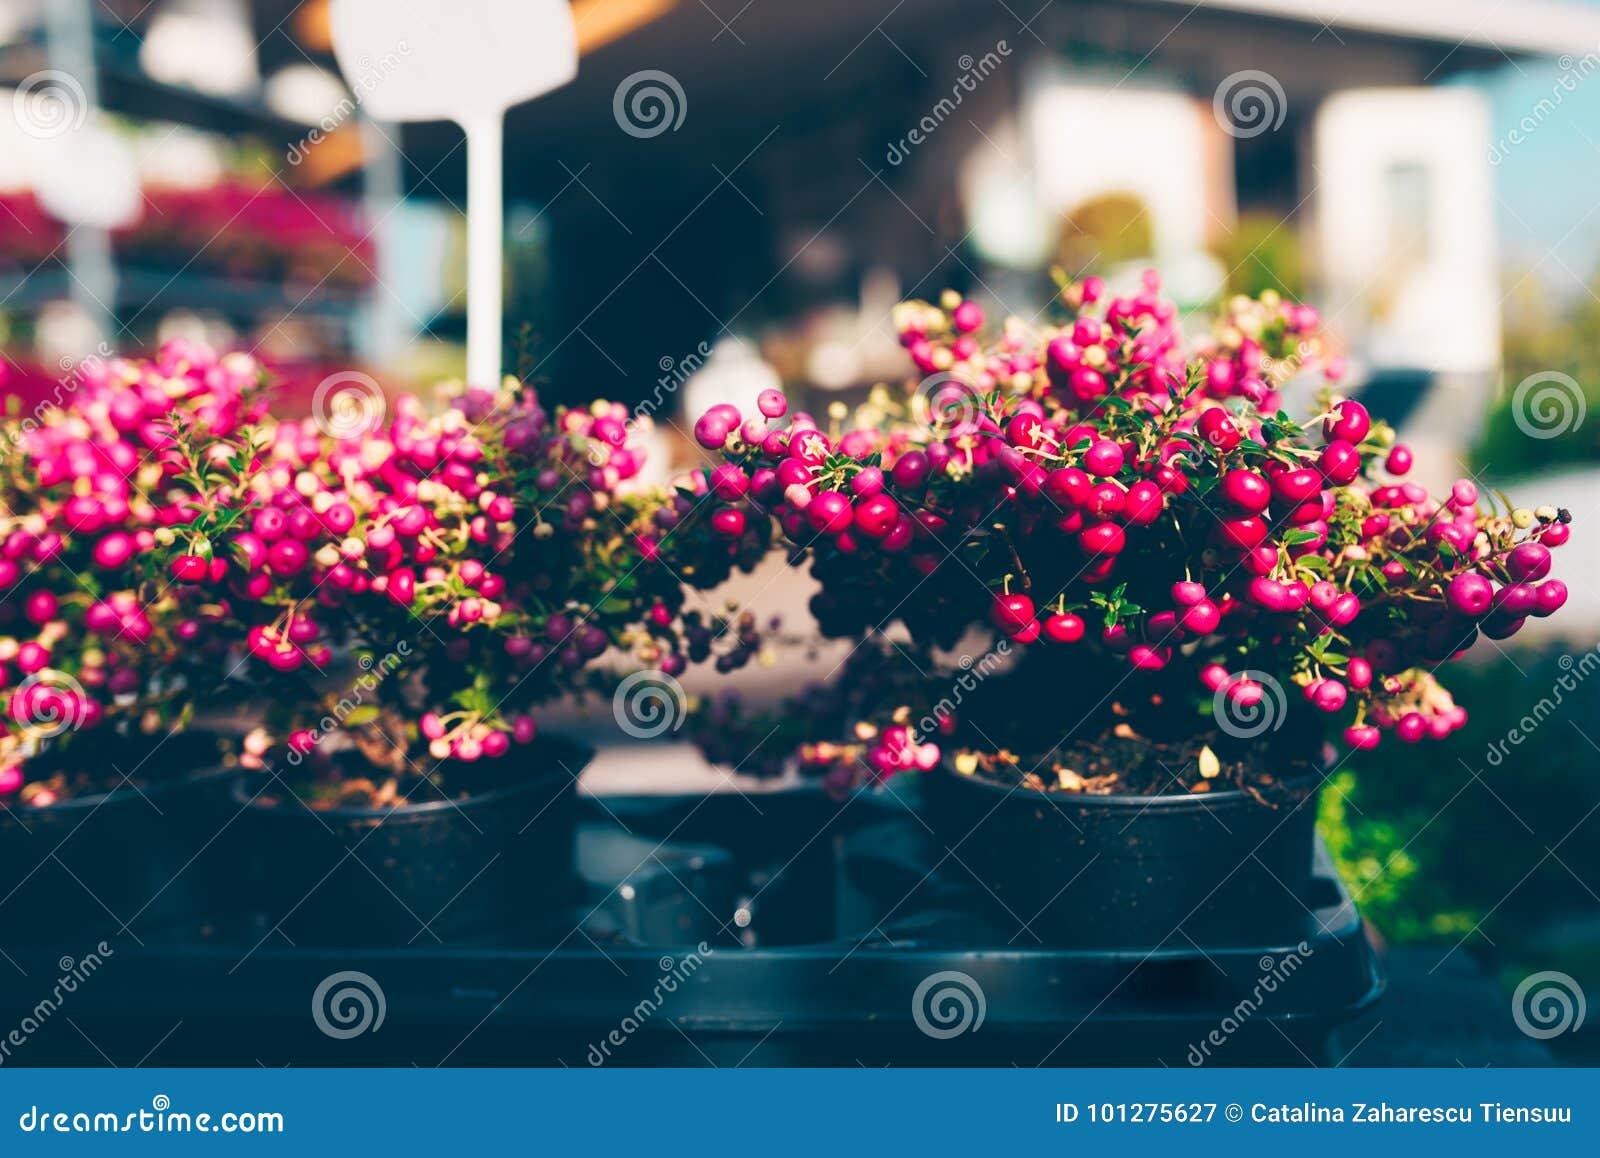 Christmas Ornamental Plant Called Prickly Heath Stock Image Image